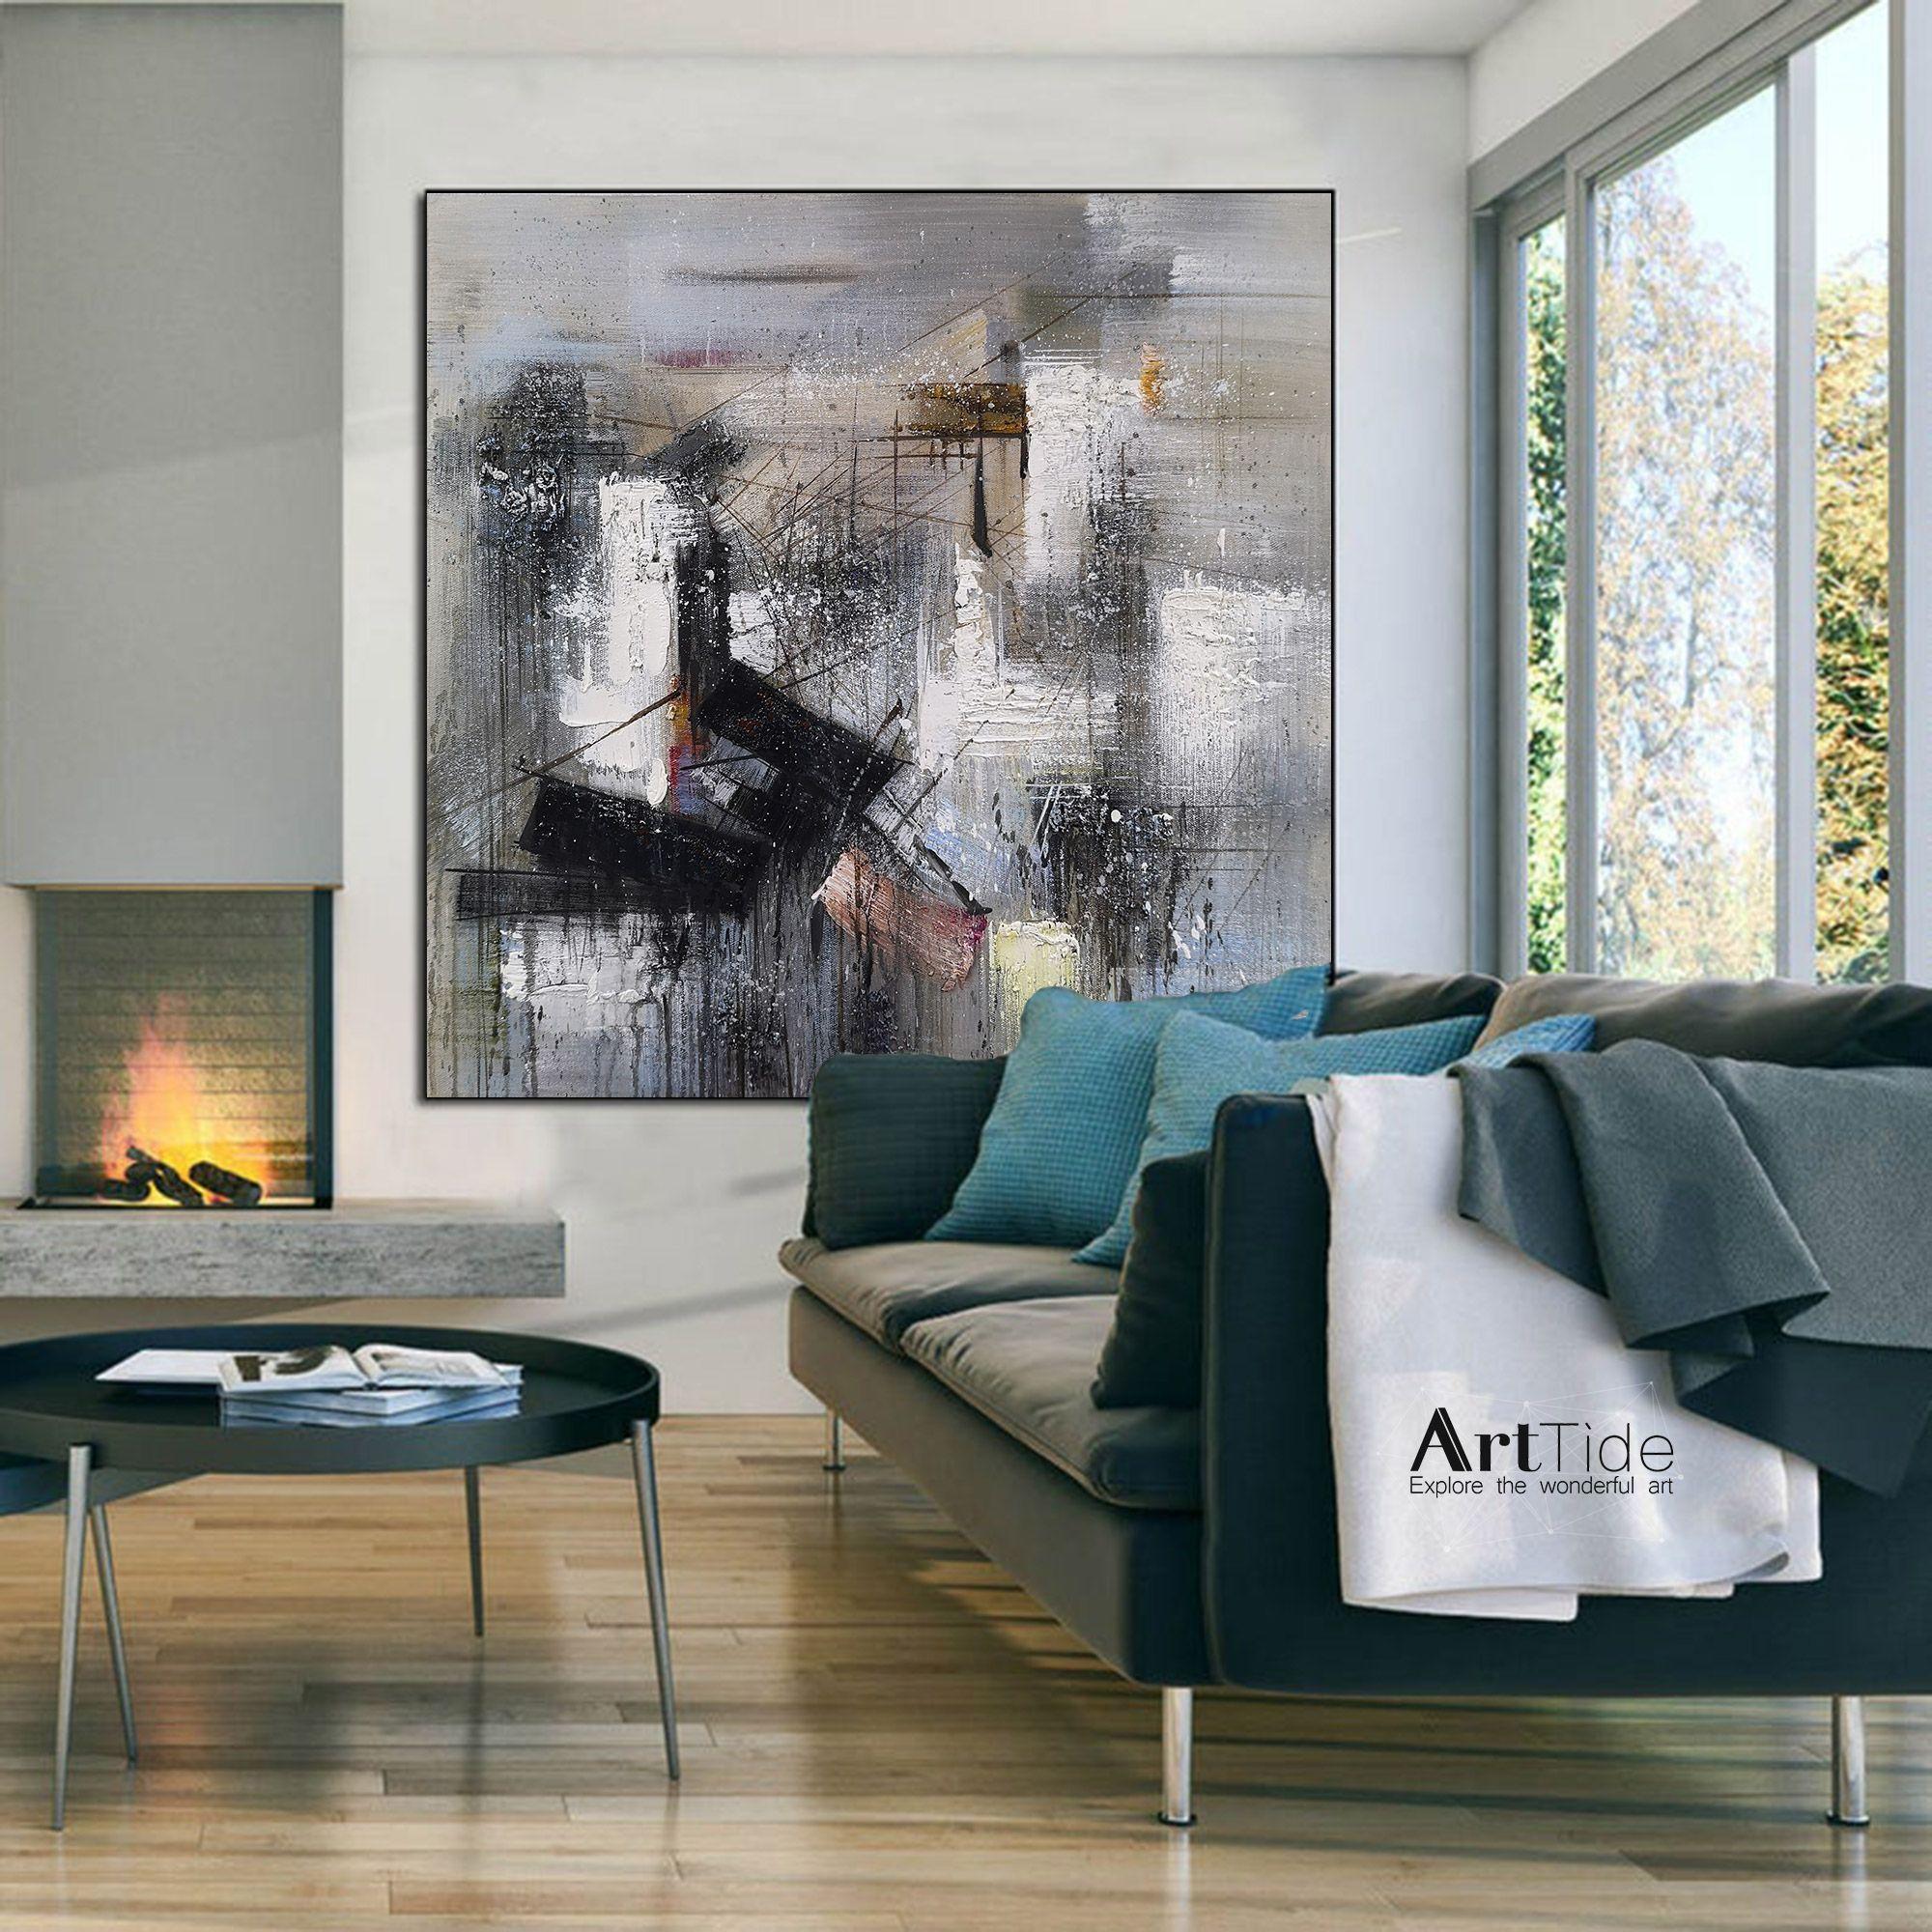 #greyinterior #greyandpink #openplanliving #silverhome #ideasforhome #homedecor #myinstahome #ikeauk #therange #cleanandtidy #houseproud #homeextension #interiors #homedecoruk #firsttimehomebuyer #greyhomesofinsta #firsttimebuyers #interioraddict #interioraccount #newbuild #homeowners #greyandwhitehome #ikeaatmine #homeaccessories #newbuildjourney #newhomeaccount #mygreyhome #greyhome #makingahouseahome